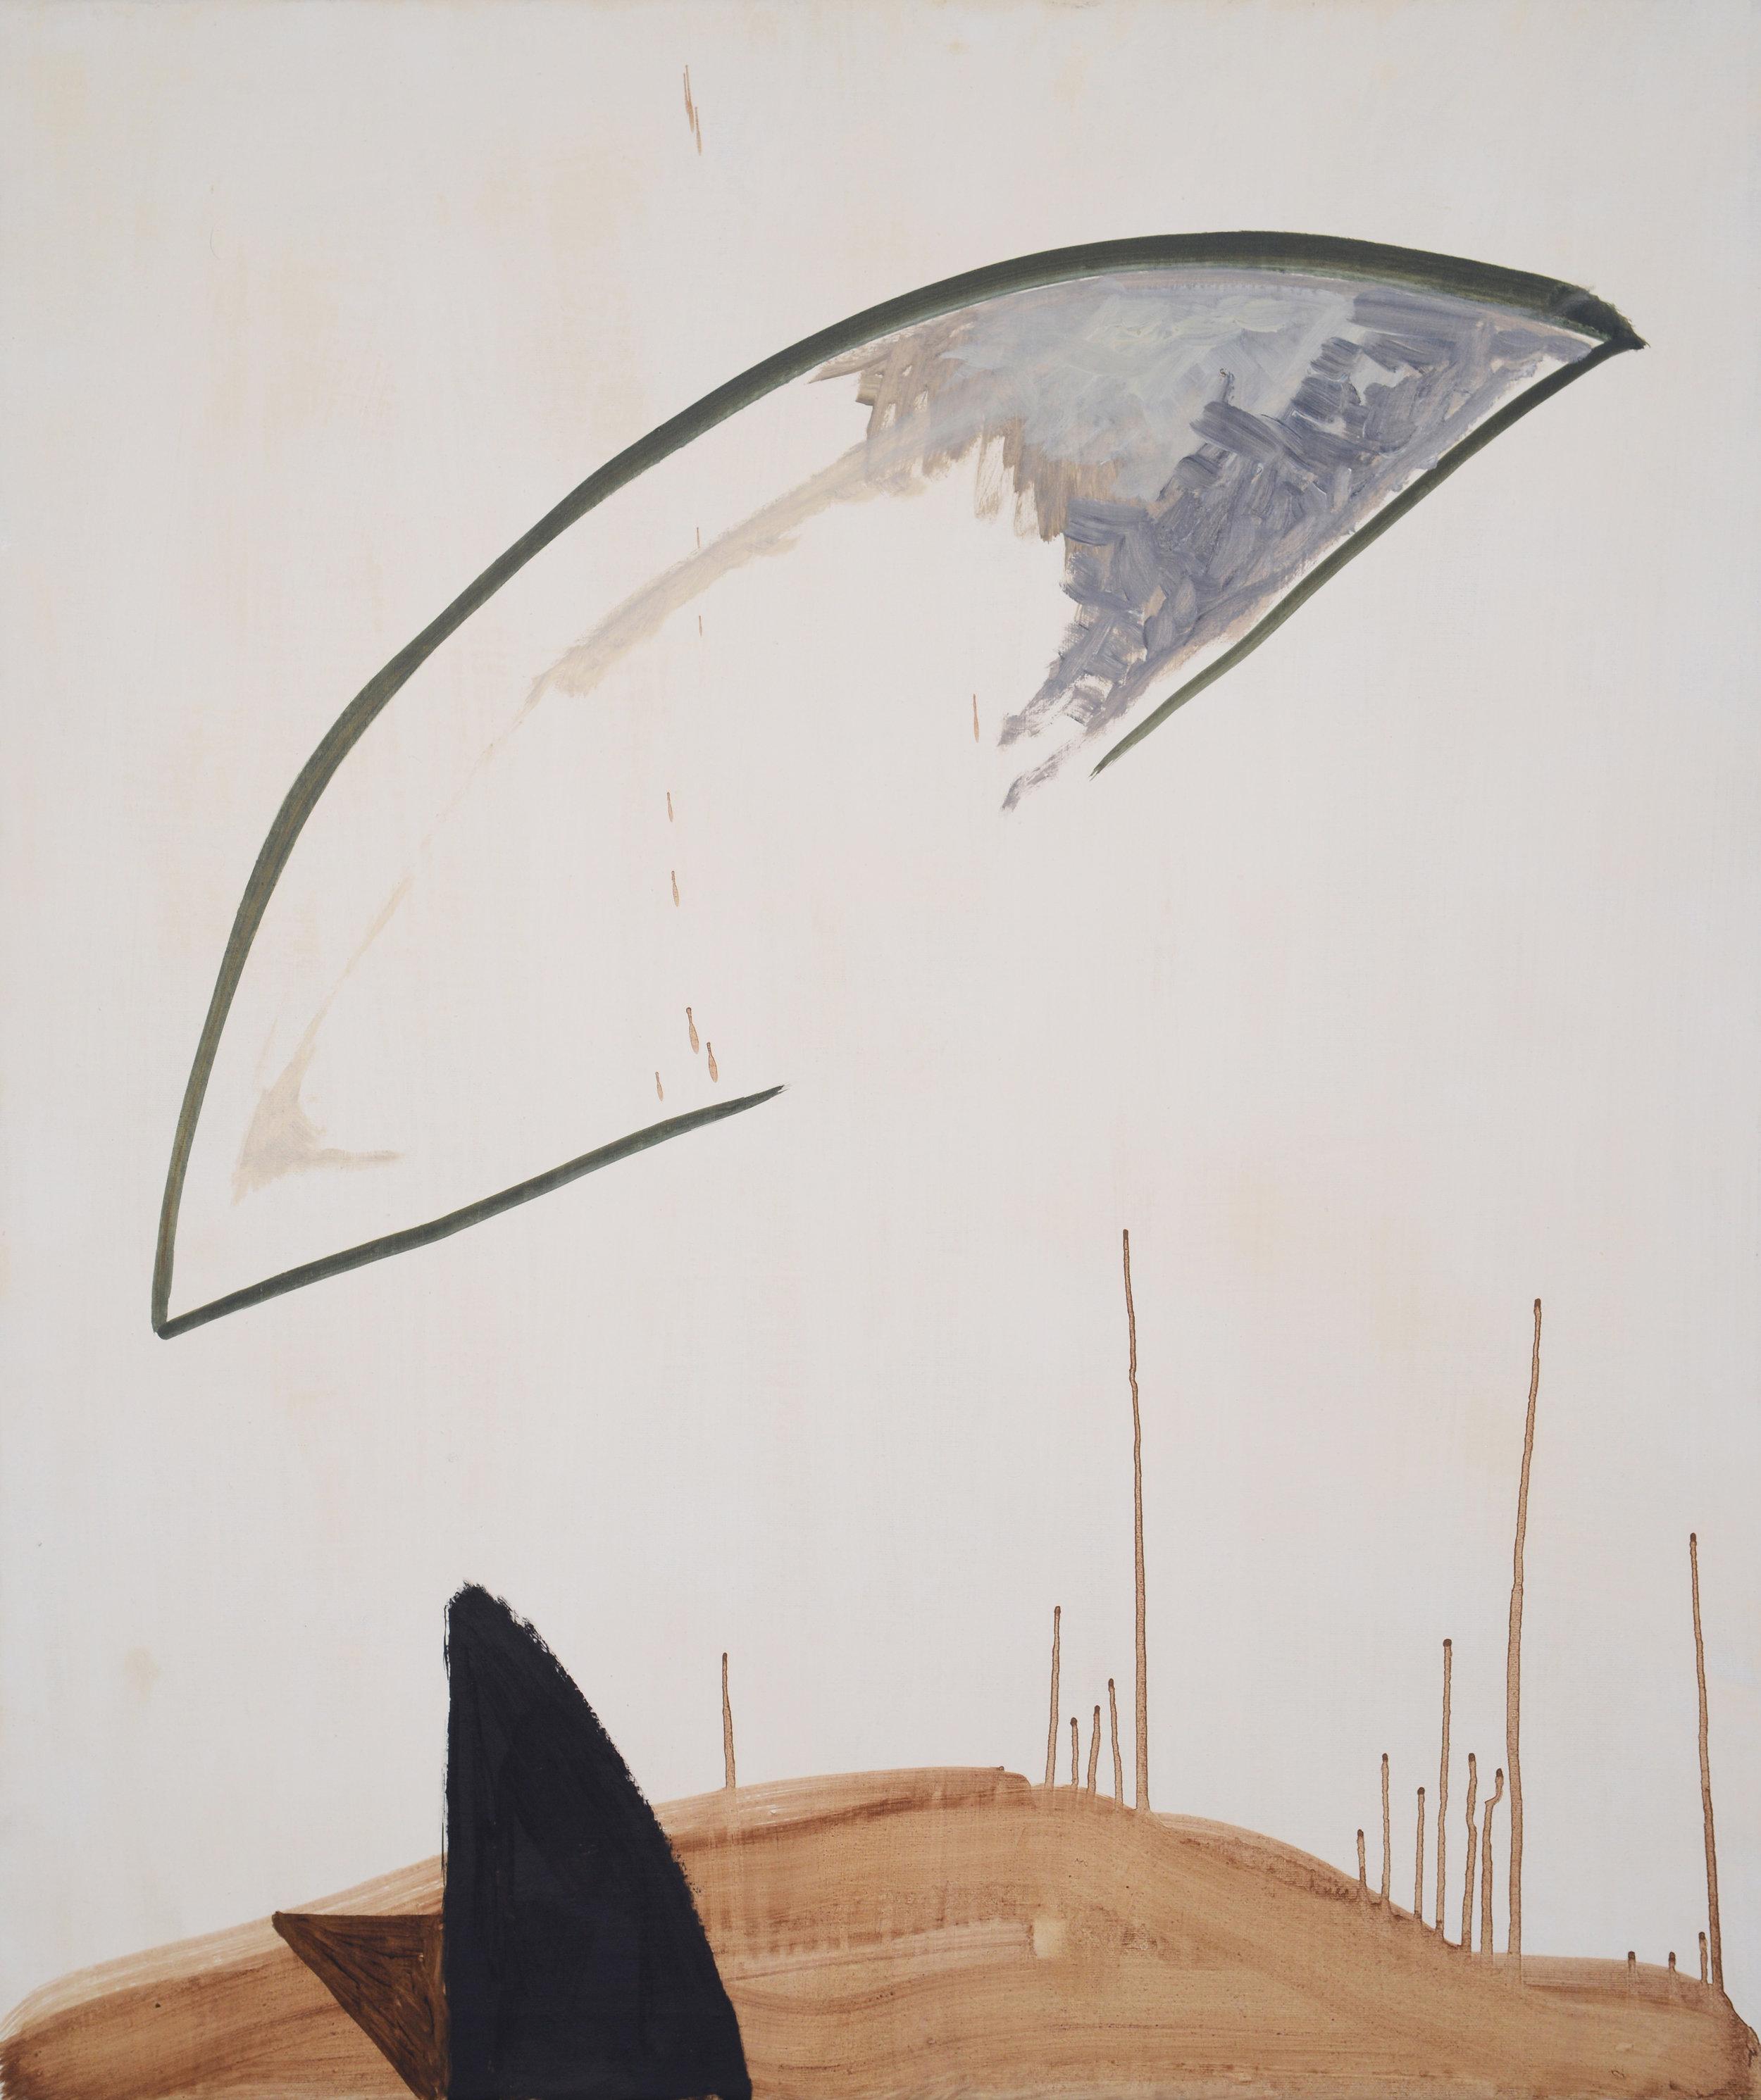 Counselor, 2013, Oil on half oil ground, 90 x 75 cm